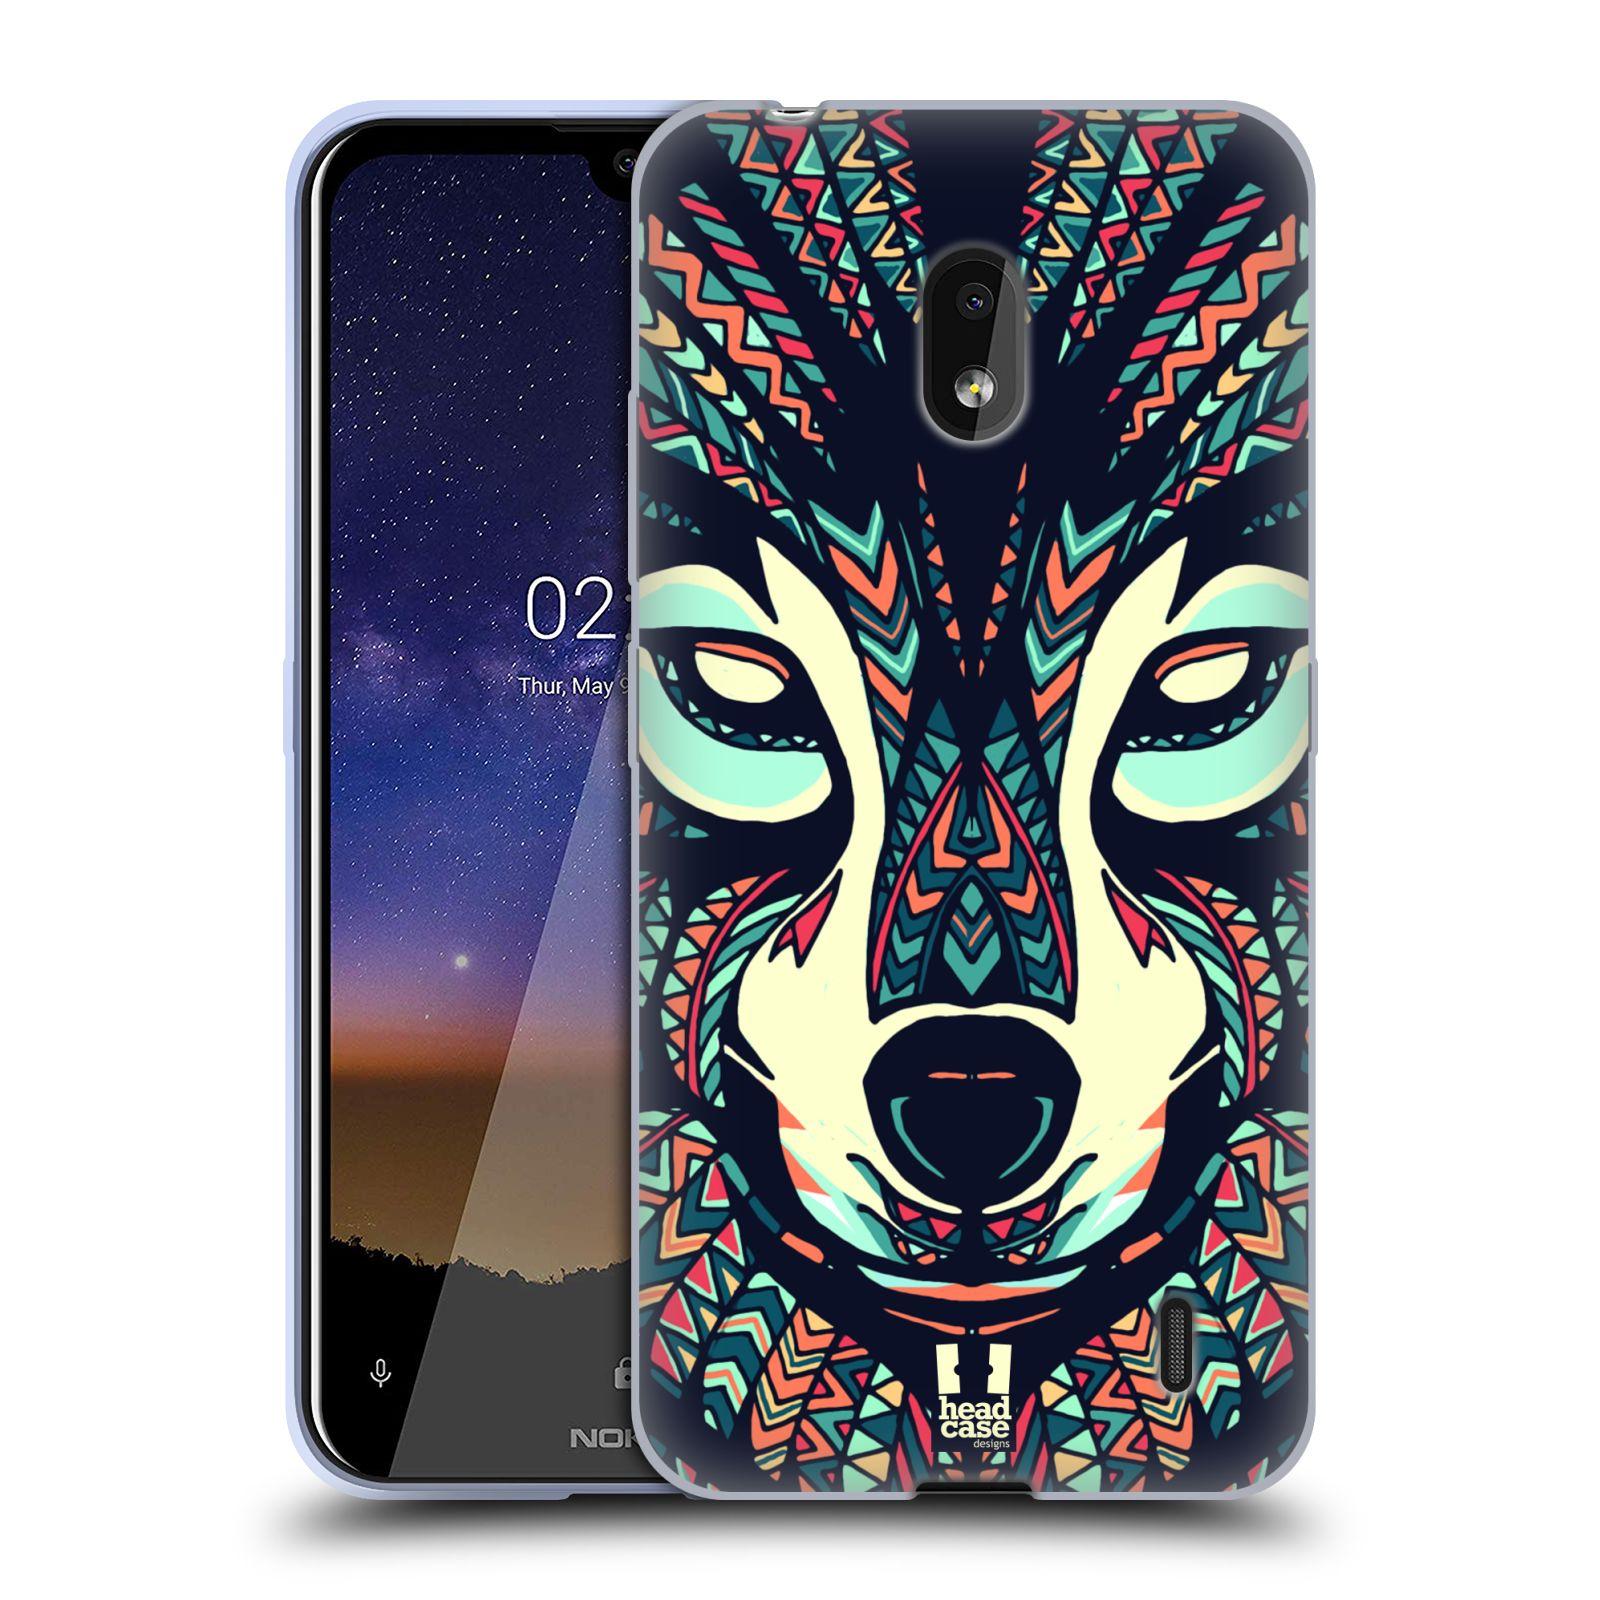 Silikonové pouzdro na mobil Nokia 2.2 - Head Case - AZTEC VLK